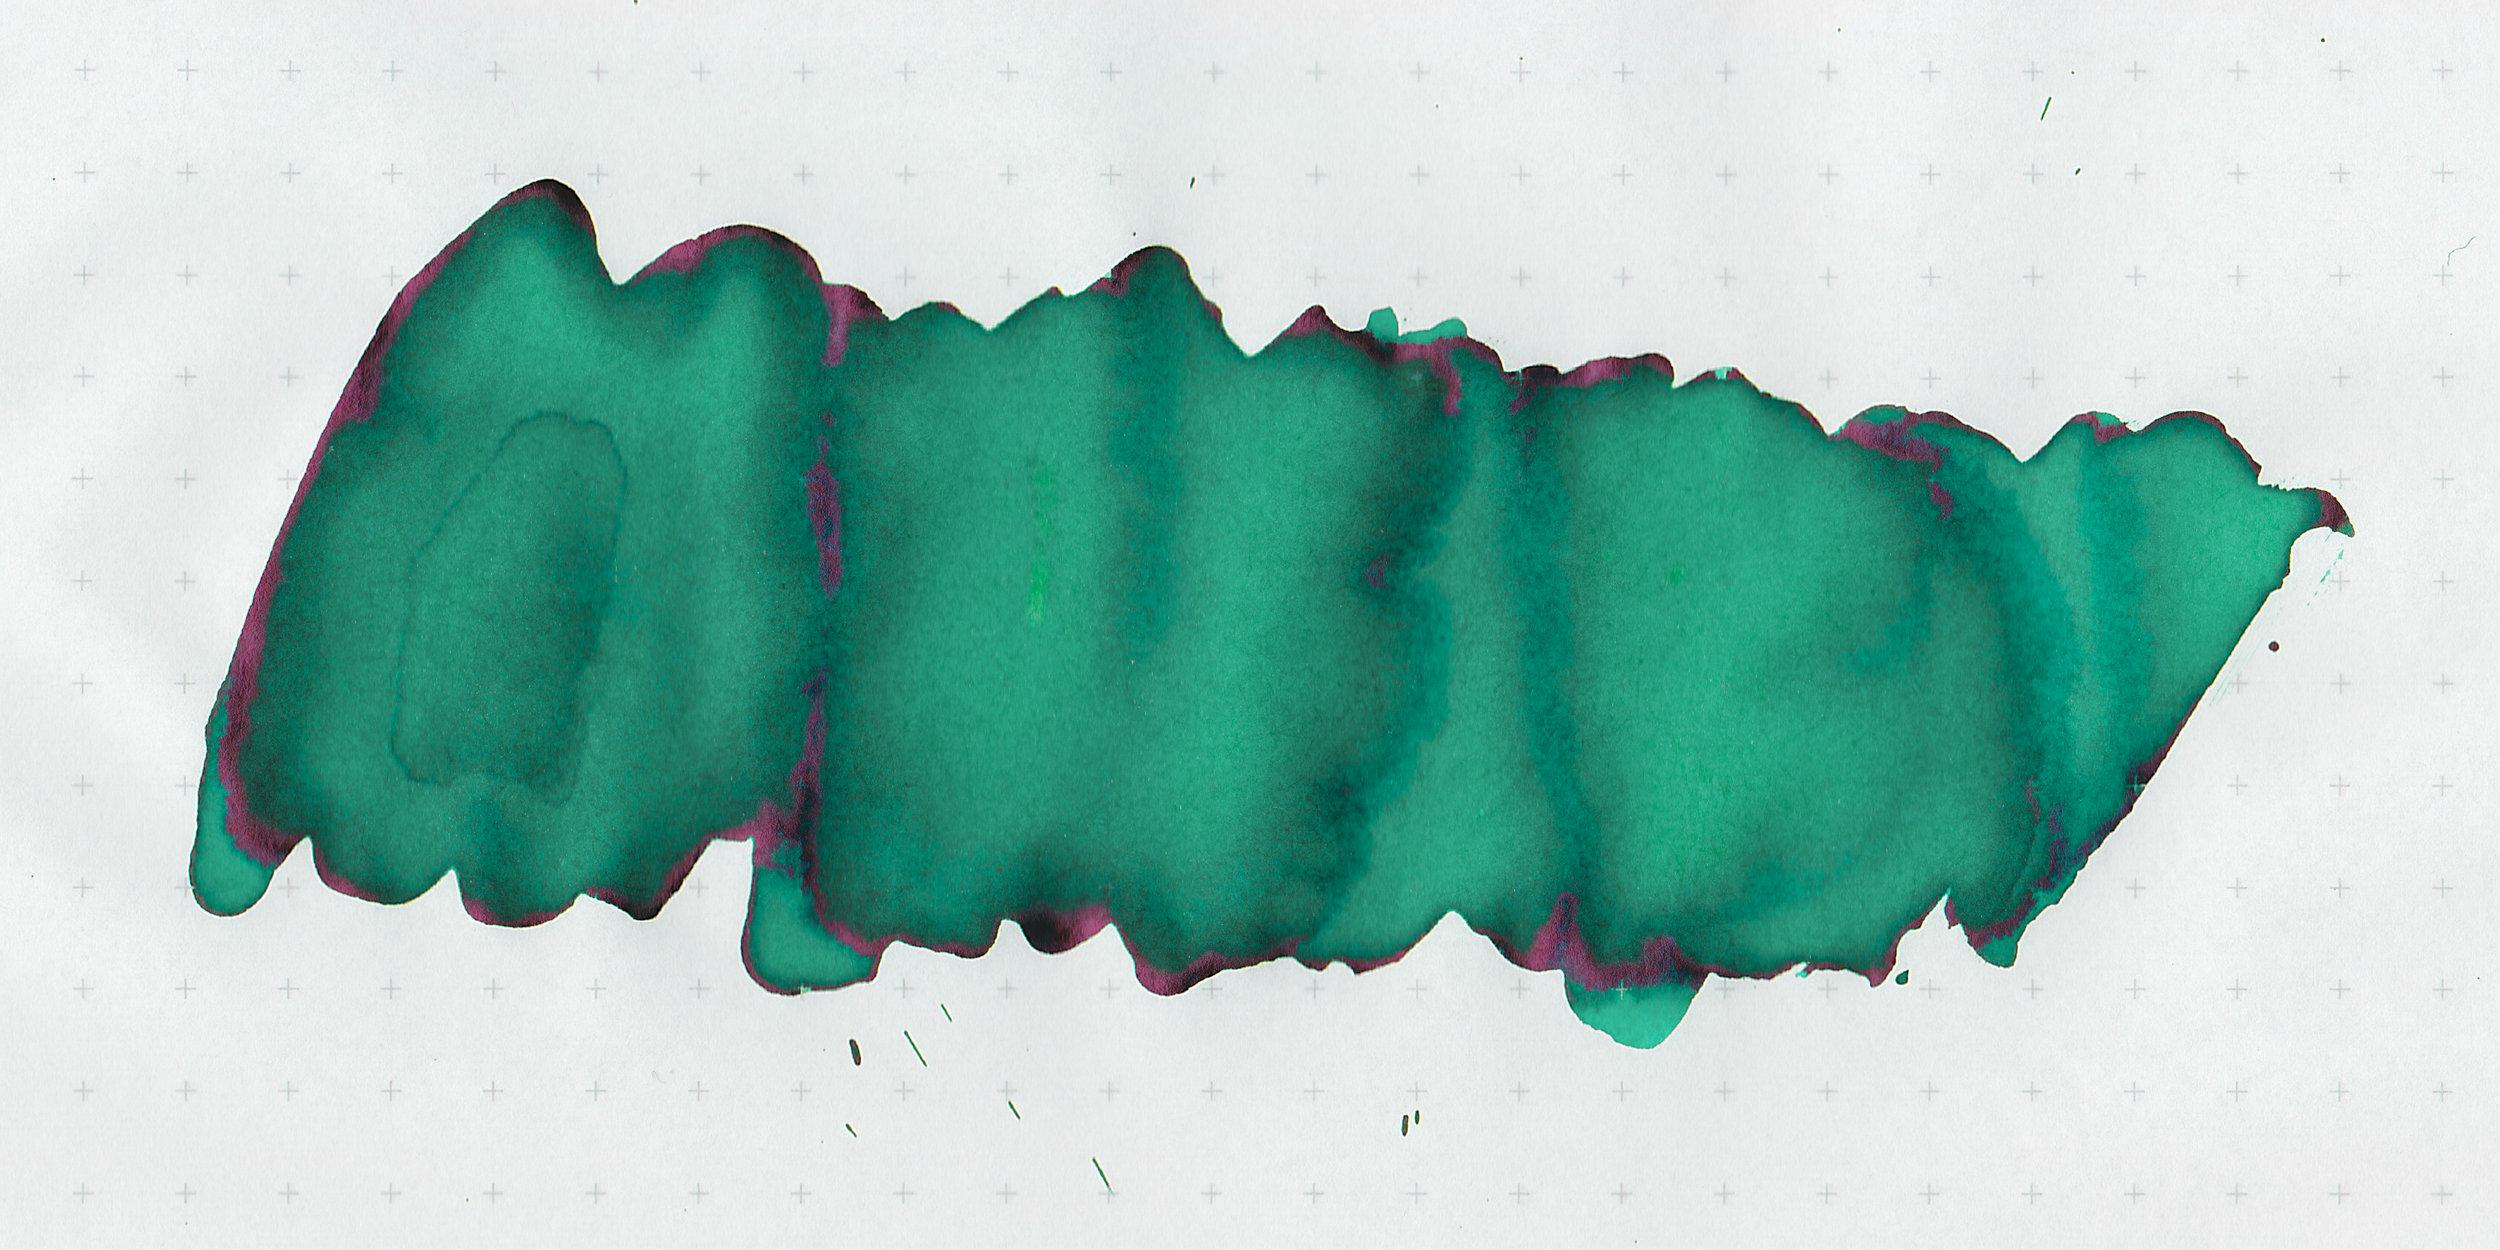 sk-palm-green-4.jpg